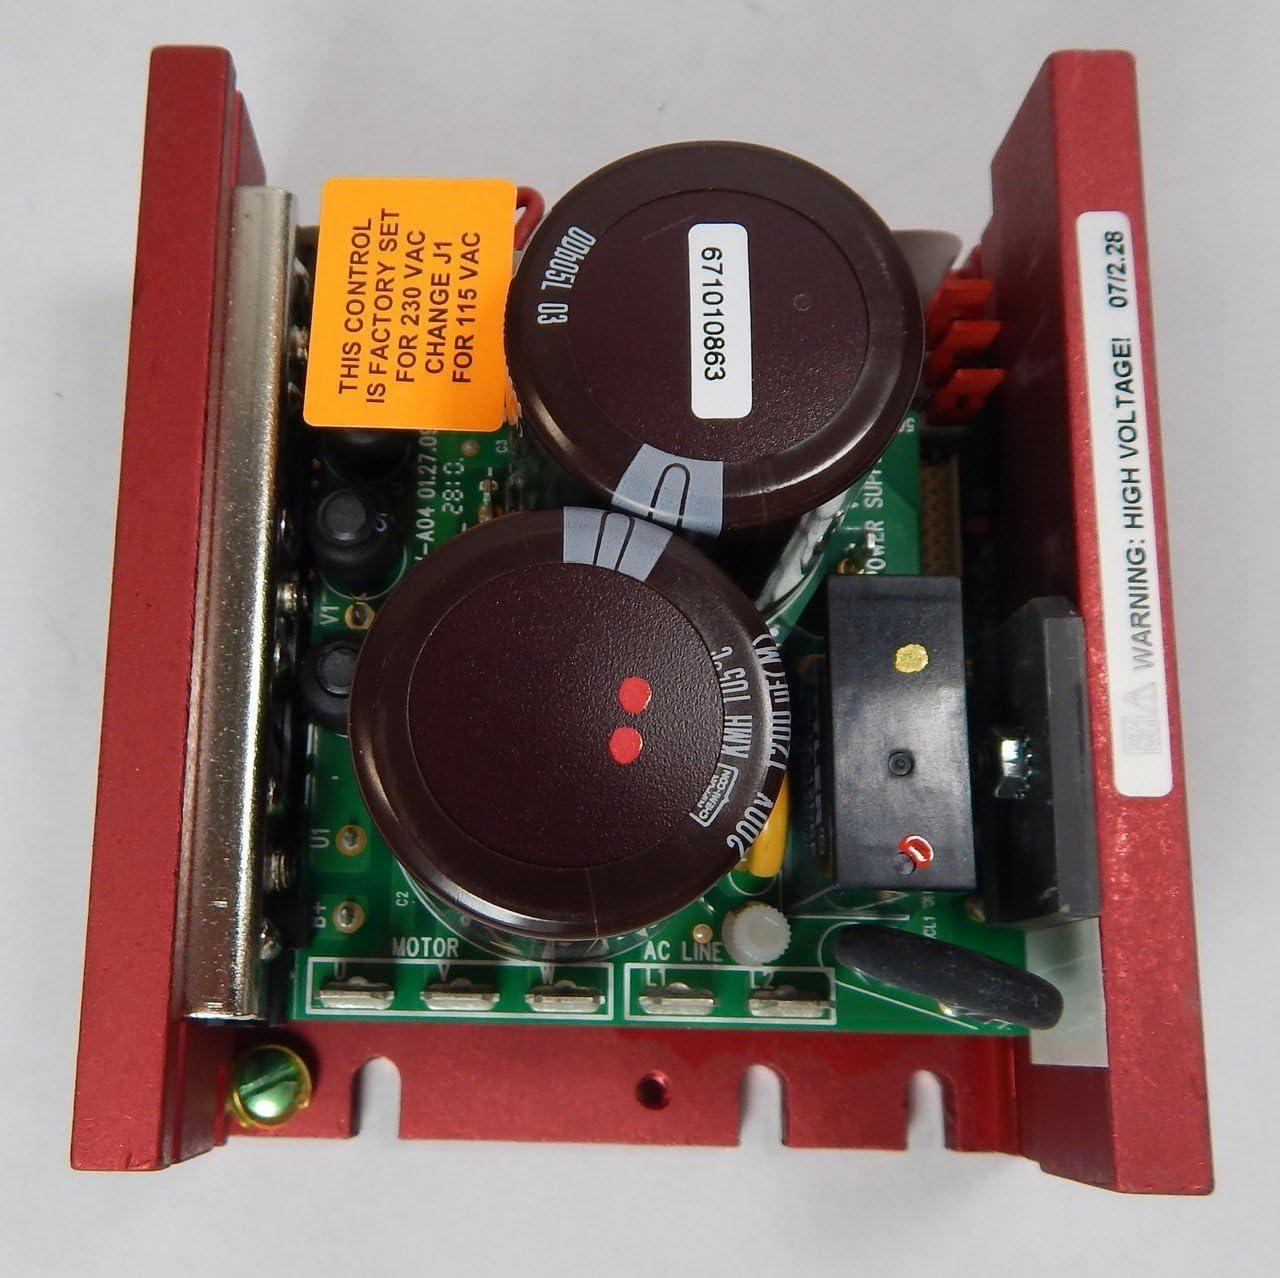 KB Electronics Single Phase to Three Phase Inverter 1//2 hp 230V # KBVF-23D